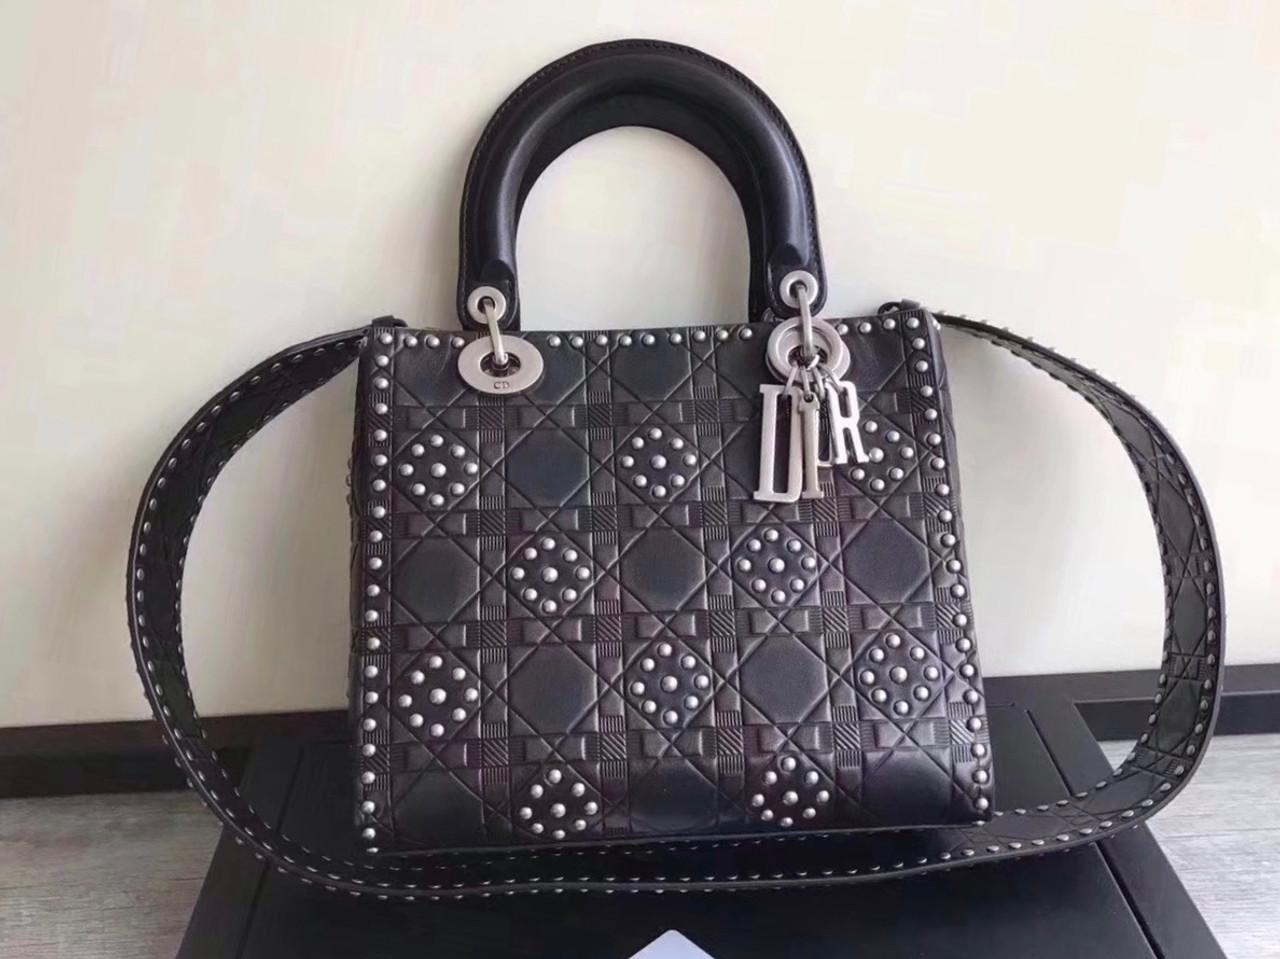 Christian Dior Cruise 2018 LADY DIOR BAG IN BLACK STUDDED CALFSKIN ... 53c2943b1ee56